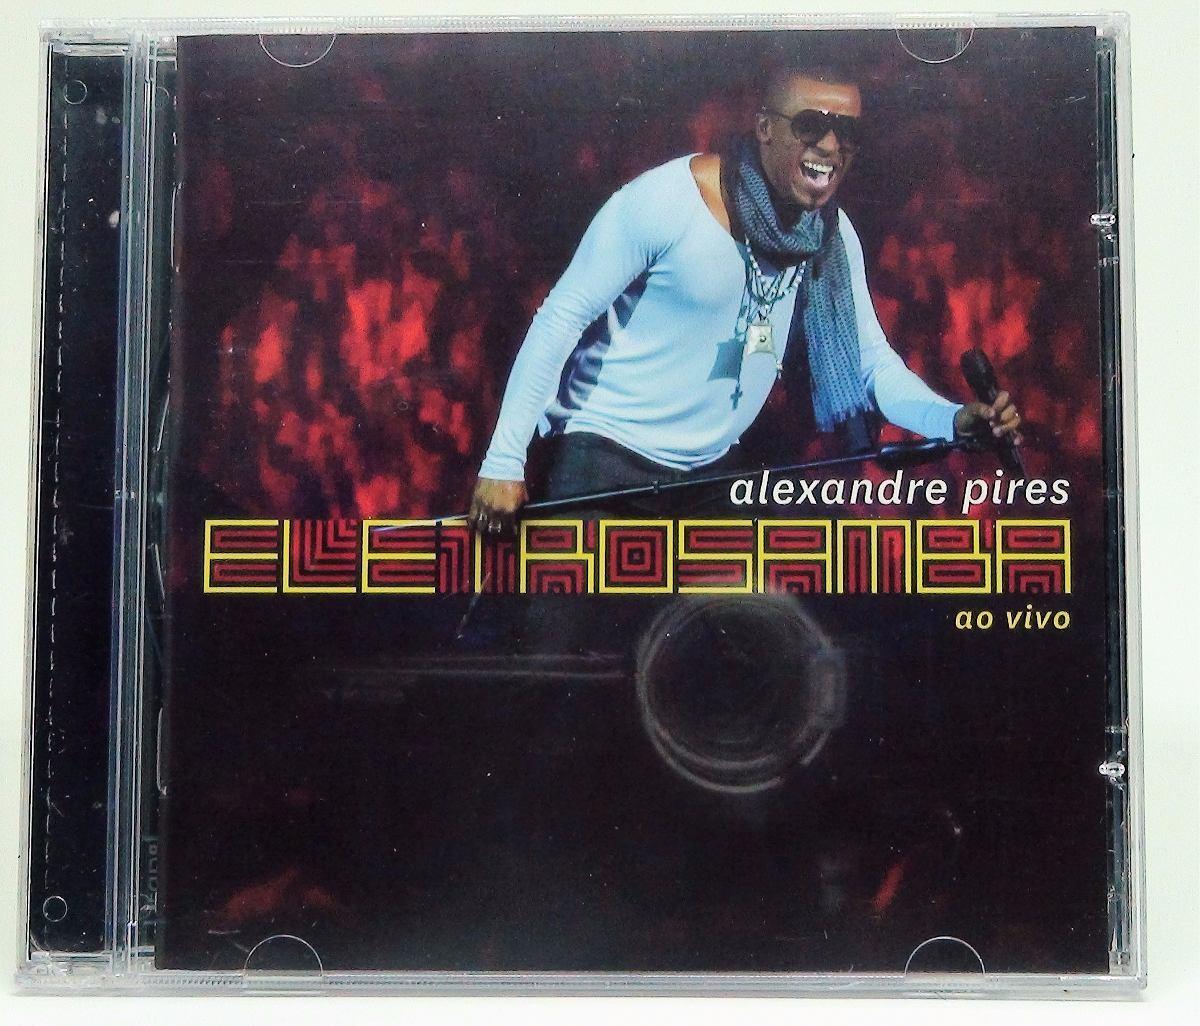 cd alexandre pires - eletro samba ao vivo